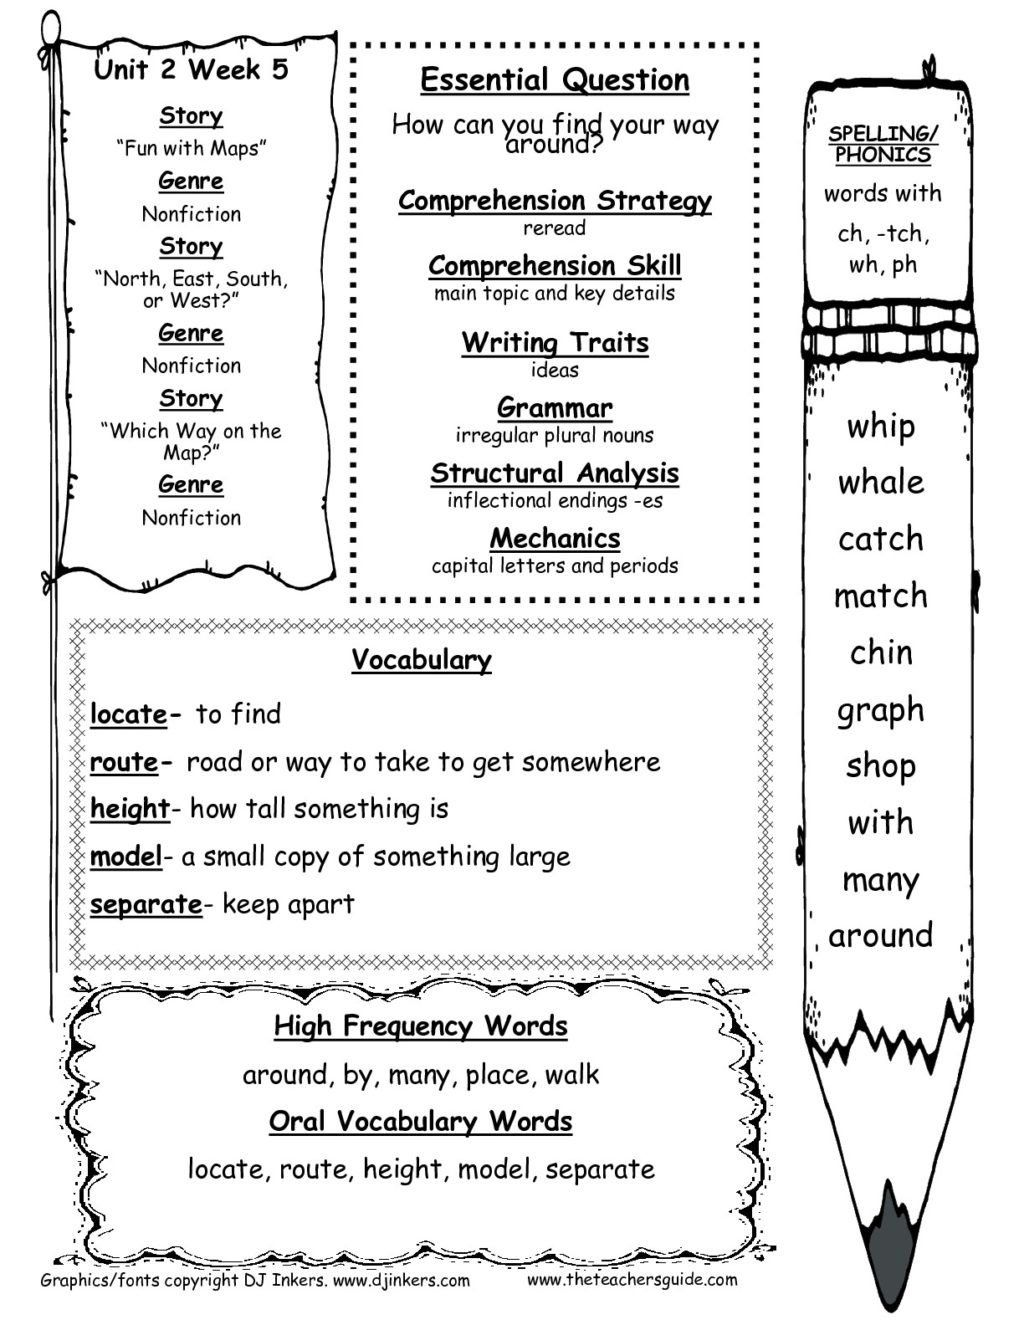 Free Map Skill Worksheets Worksheet Worksheet Free Worksheets for 2nd Grade    First grade worksheets [ 1325 x 1024 Pixel ]